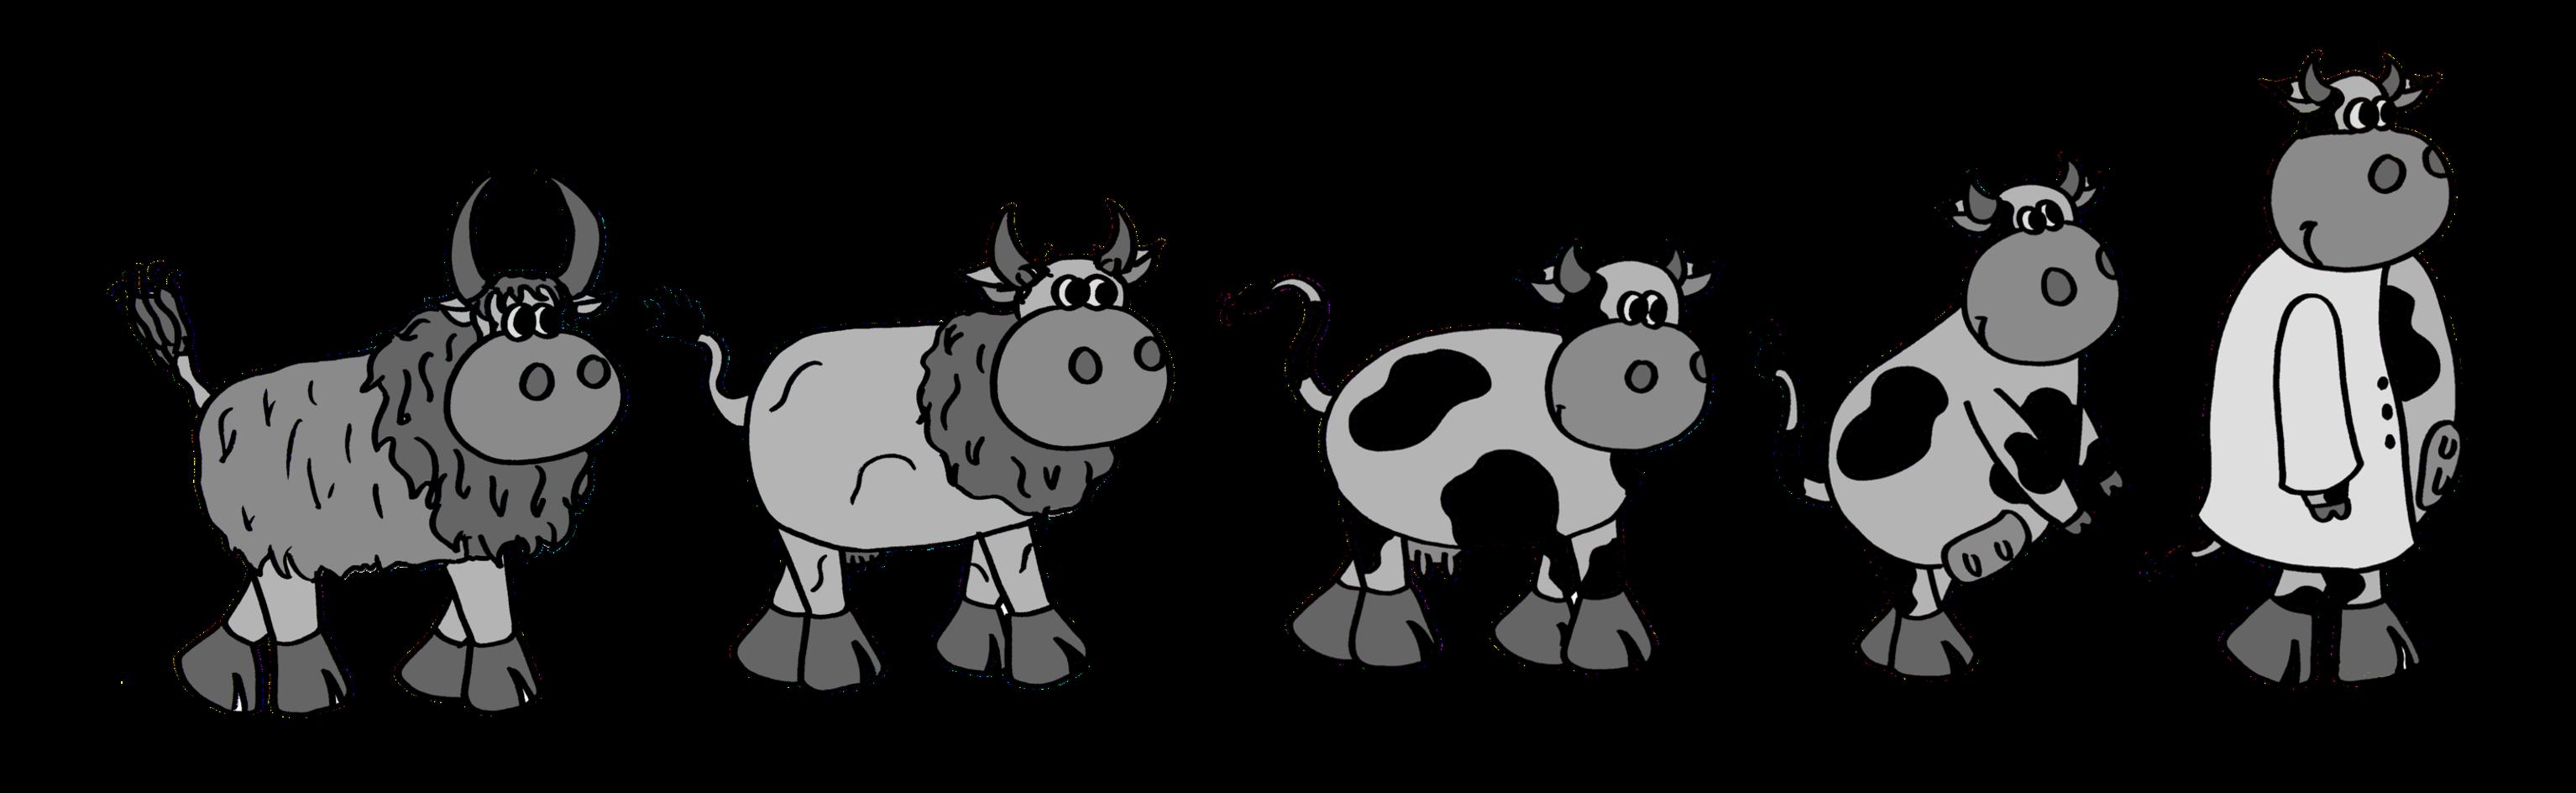 Clipart cow digestive system. Team braunschweig project content